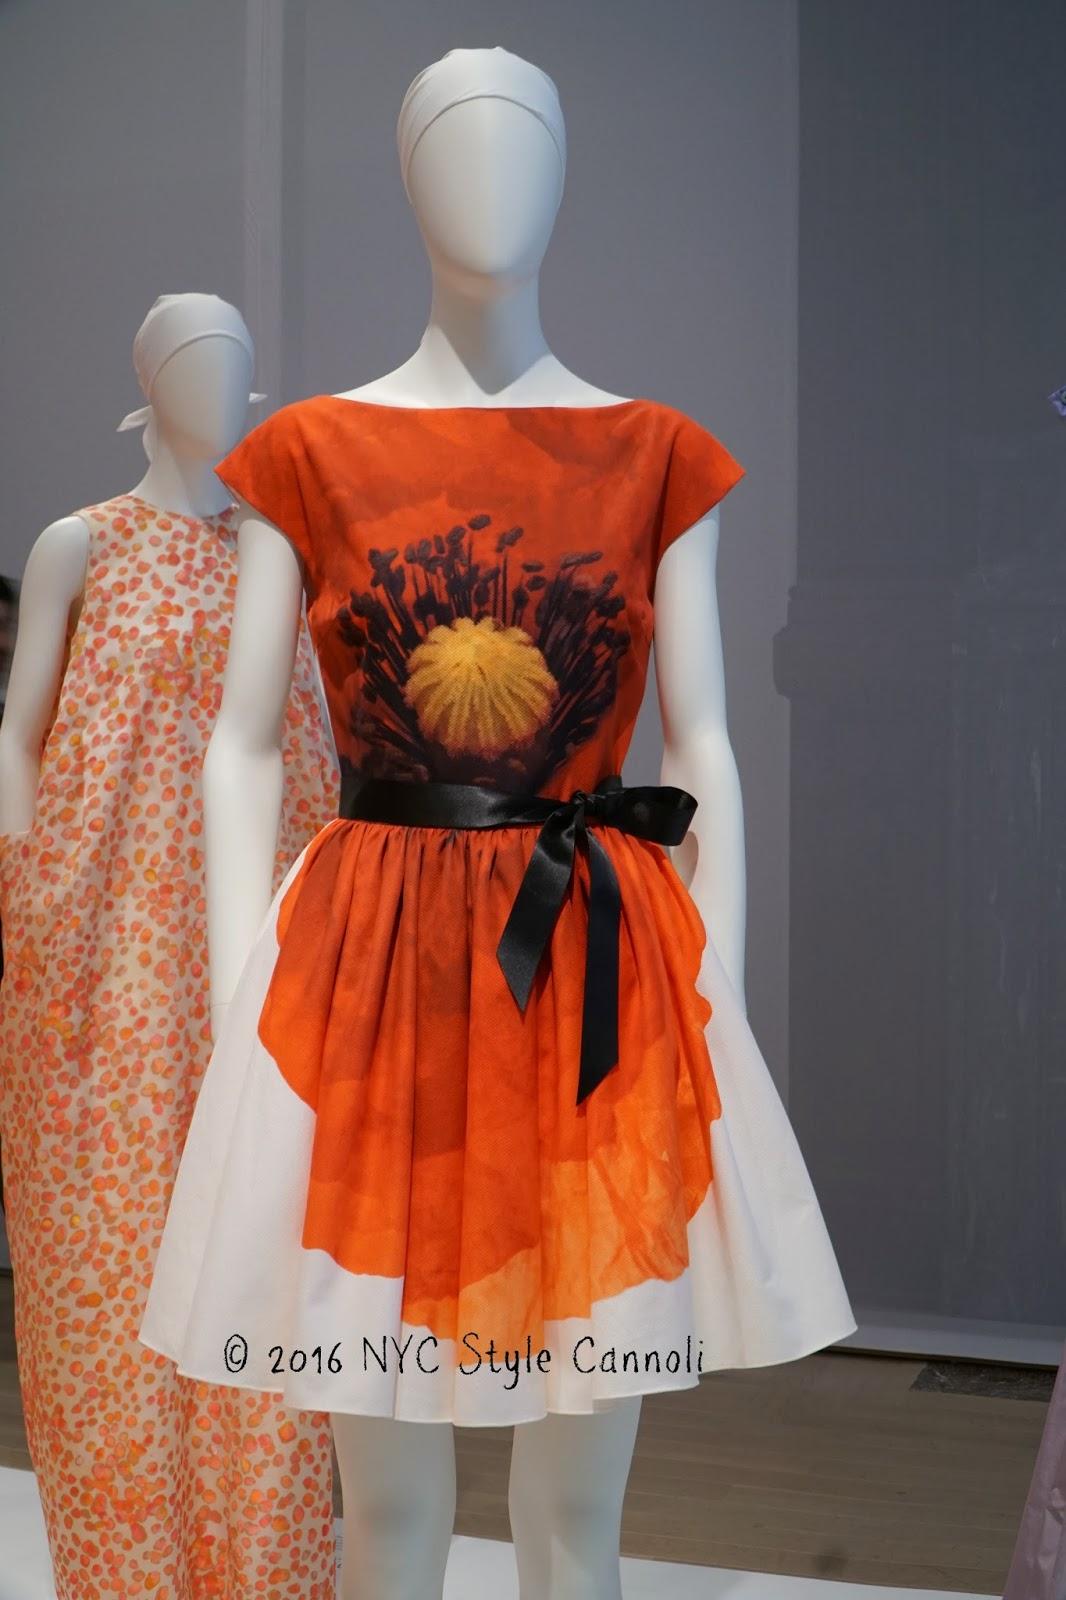 Target Wedding Dresses Isaac Mizrahi 81 Stunning They really show you